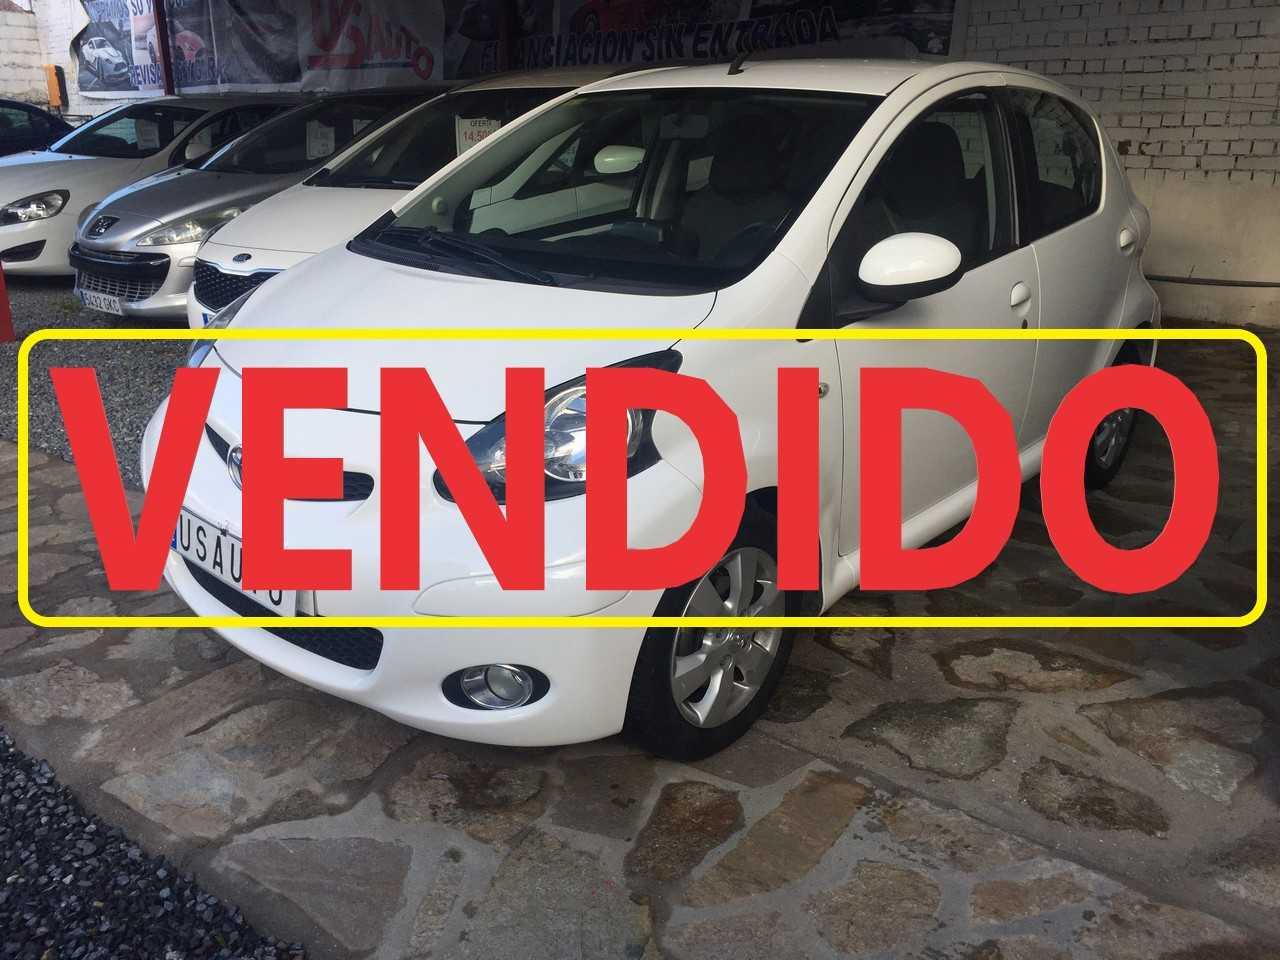 Toyota Aygo Gasolina en Collado Villalba